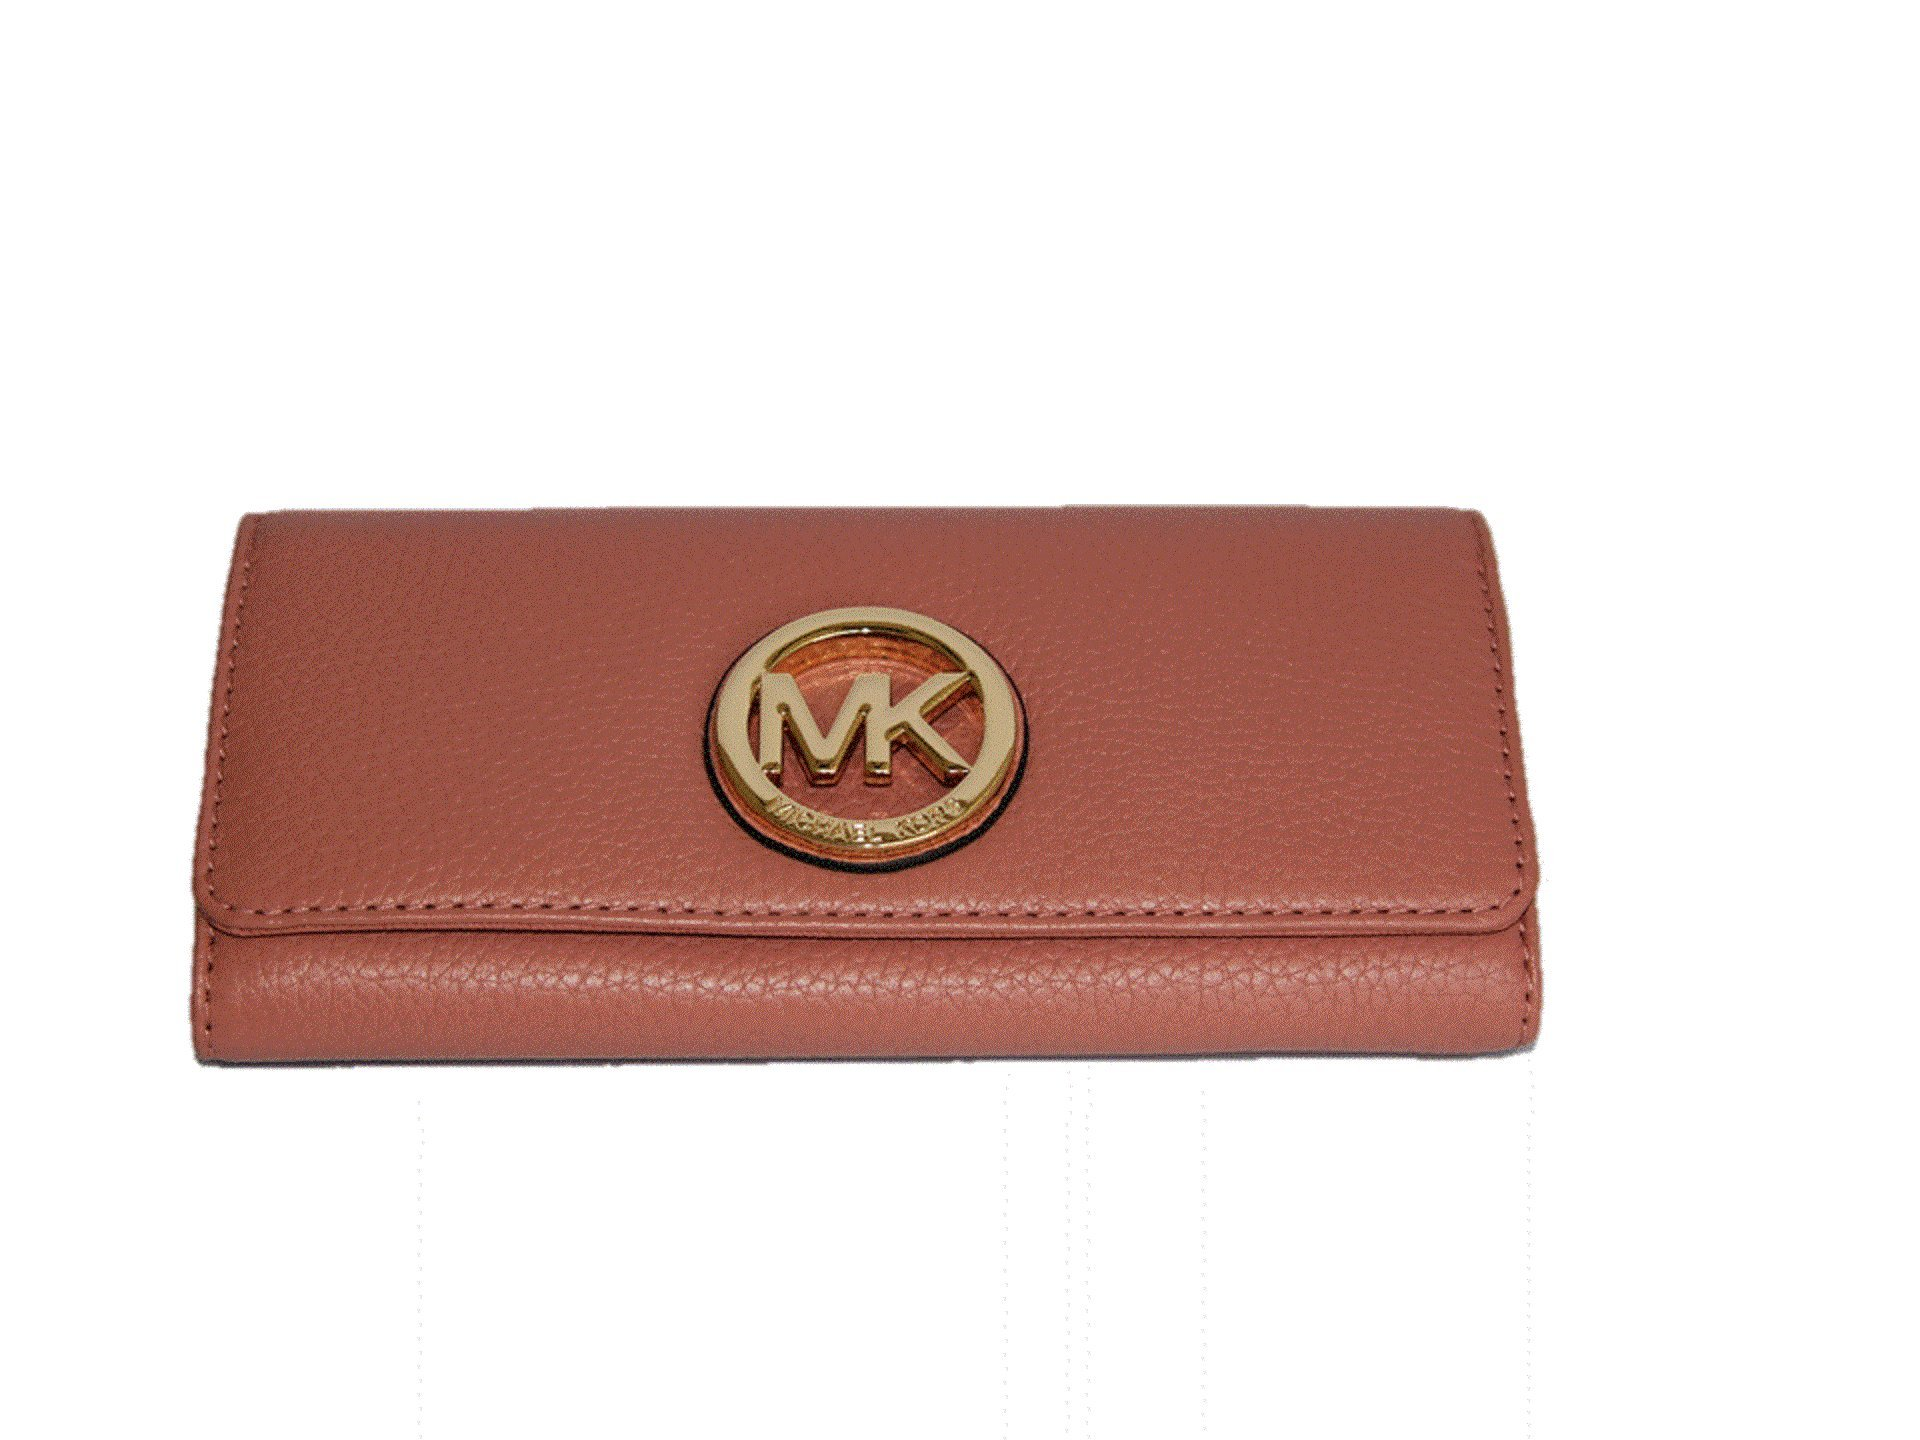 Michael Kors Fulton Flap Leather Continental Wallet - Antique Rose